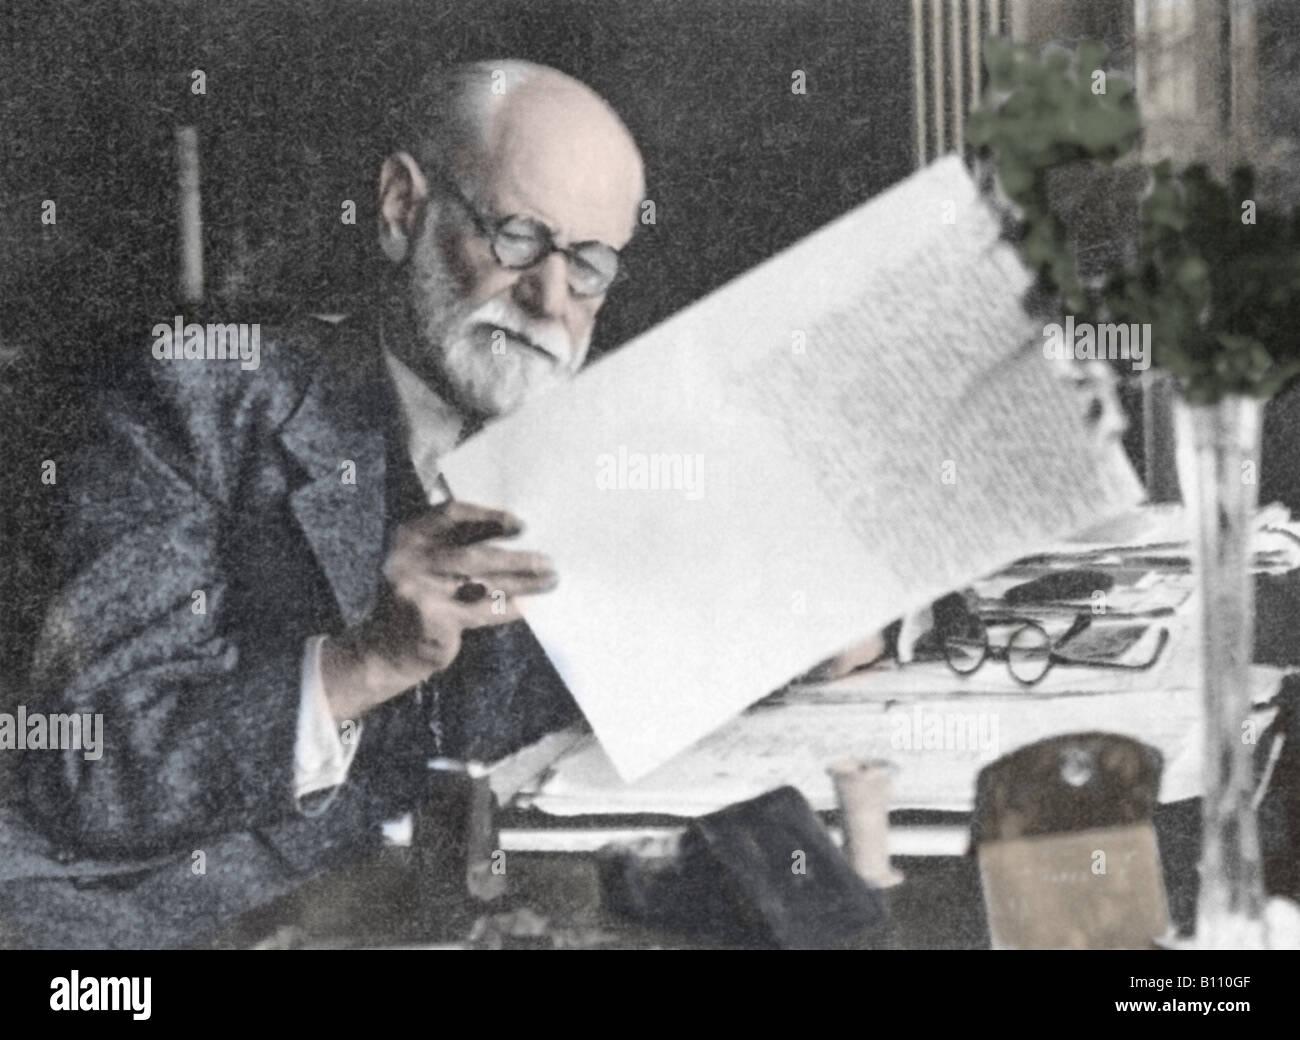 Sigmund Freud, 1856 - 1939, Austrian psychologist. Stock Photo